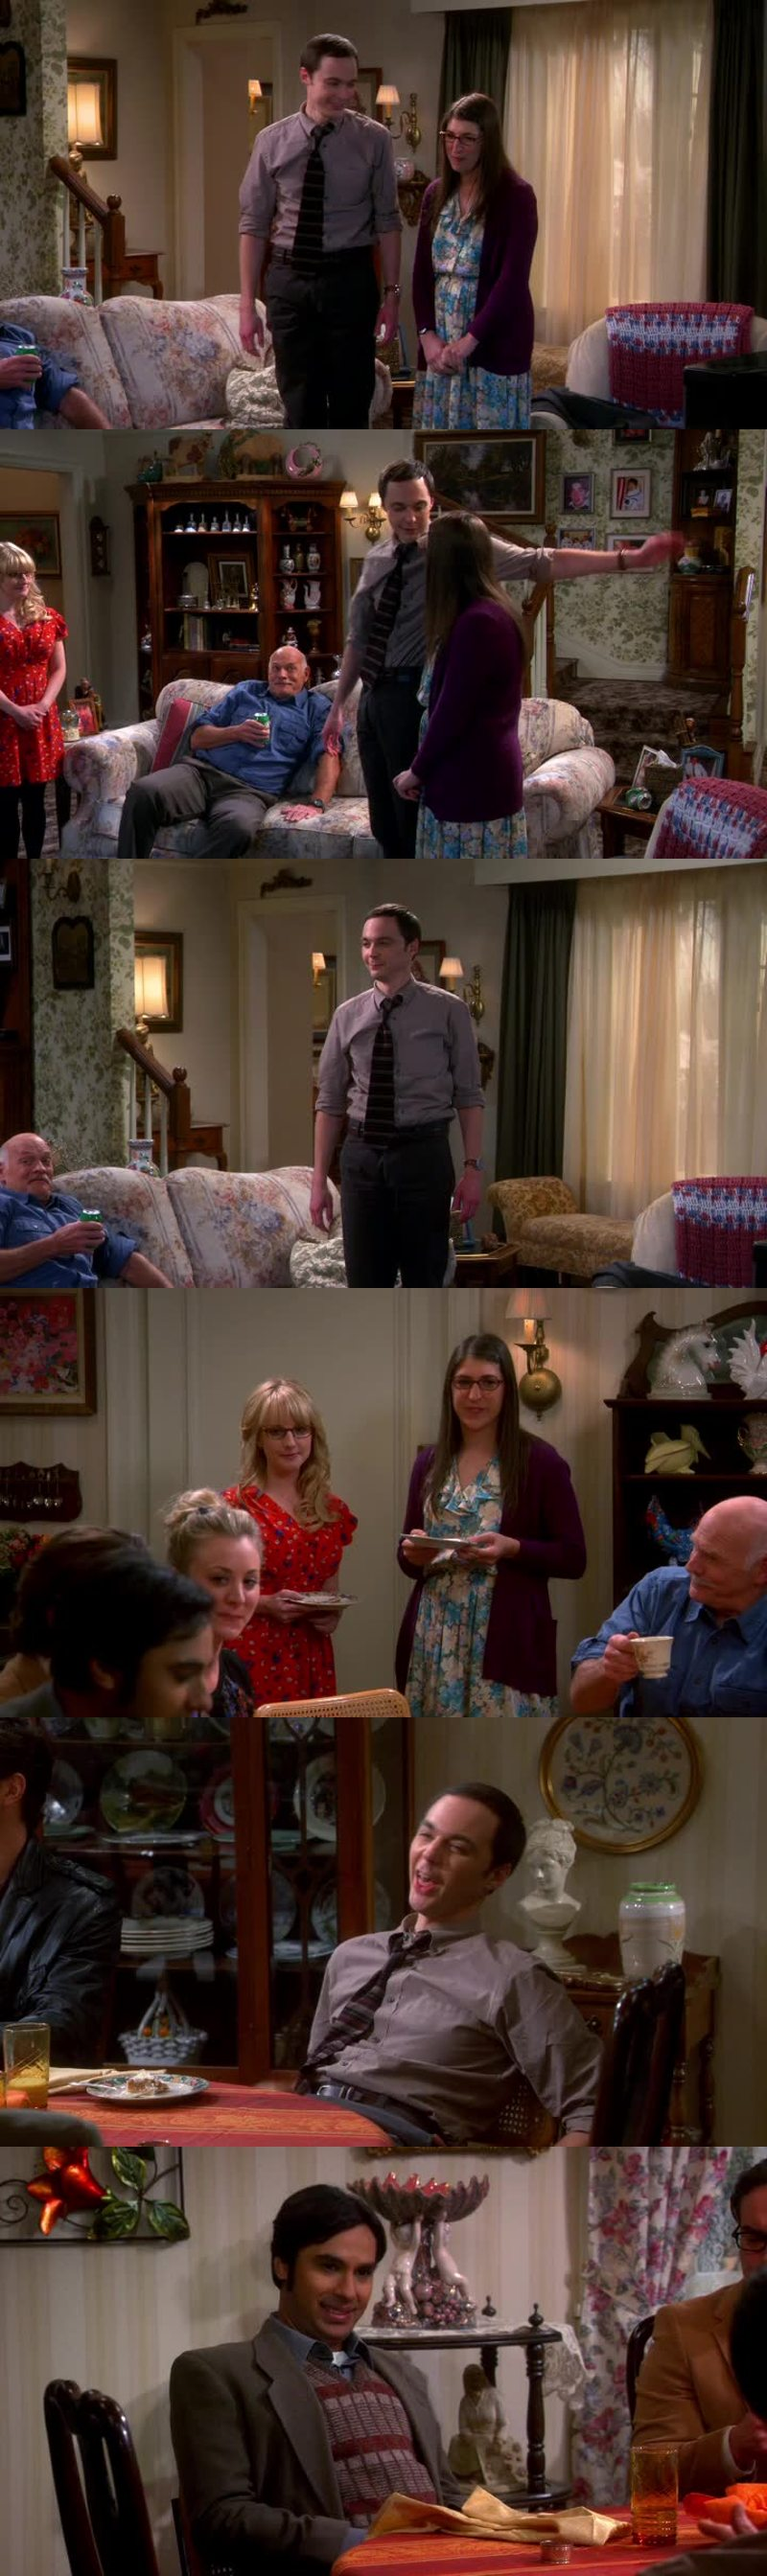 esses momentos kkkk ♥♡ Sheldon ♥♡